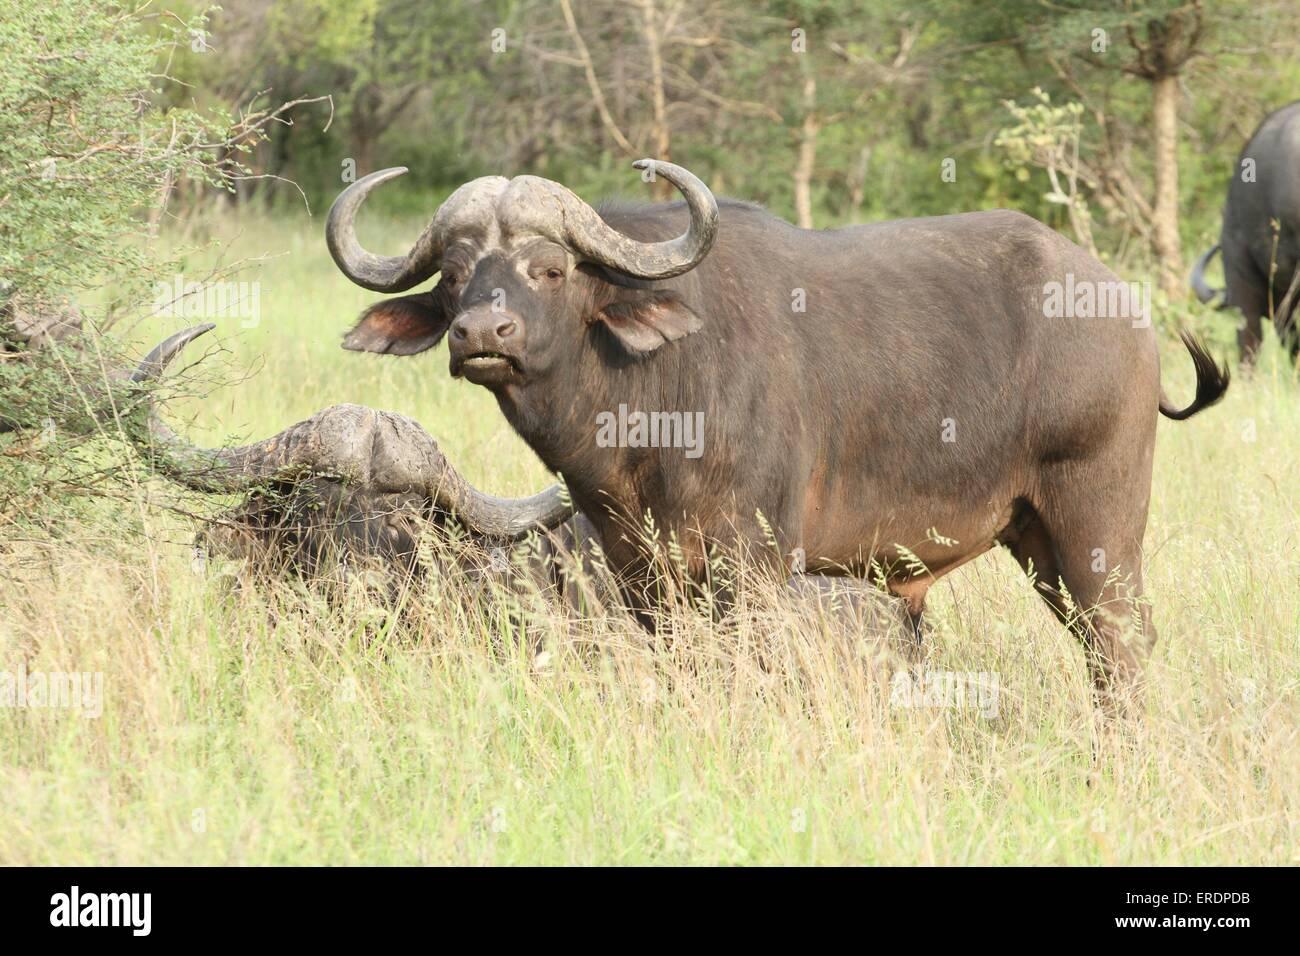 African cape buffalos - Stock Image